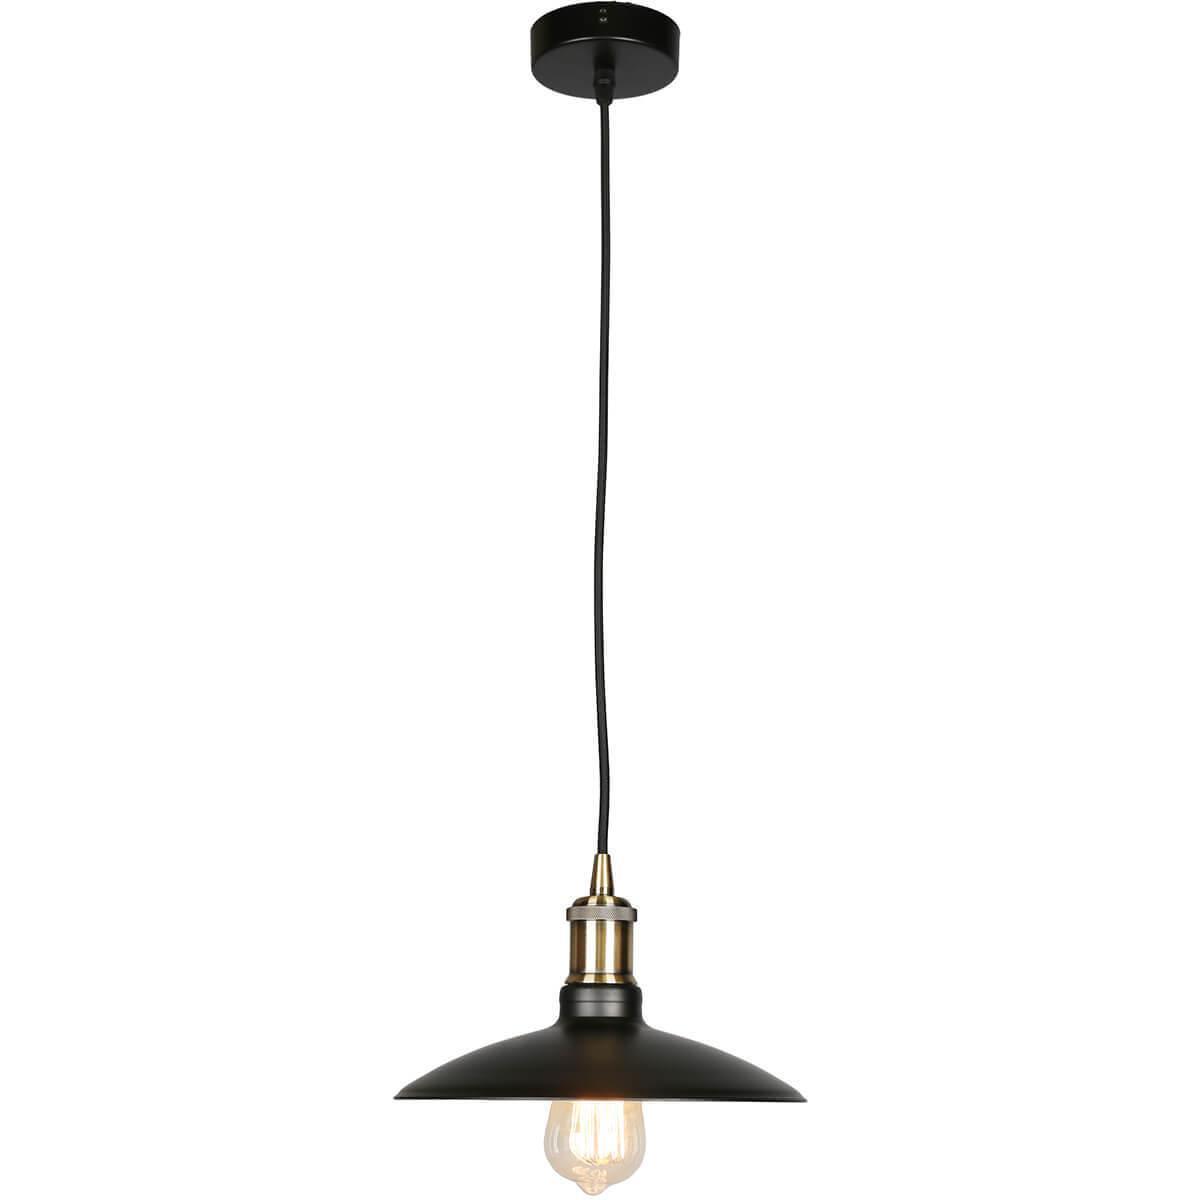 Подвесной светильник Omnilux OML-90806-01, E27, 60 Вт